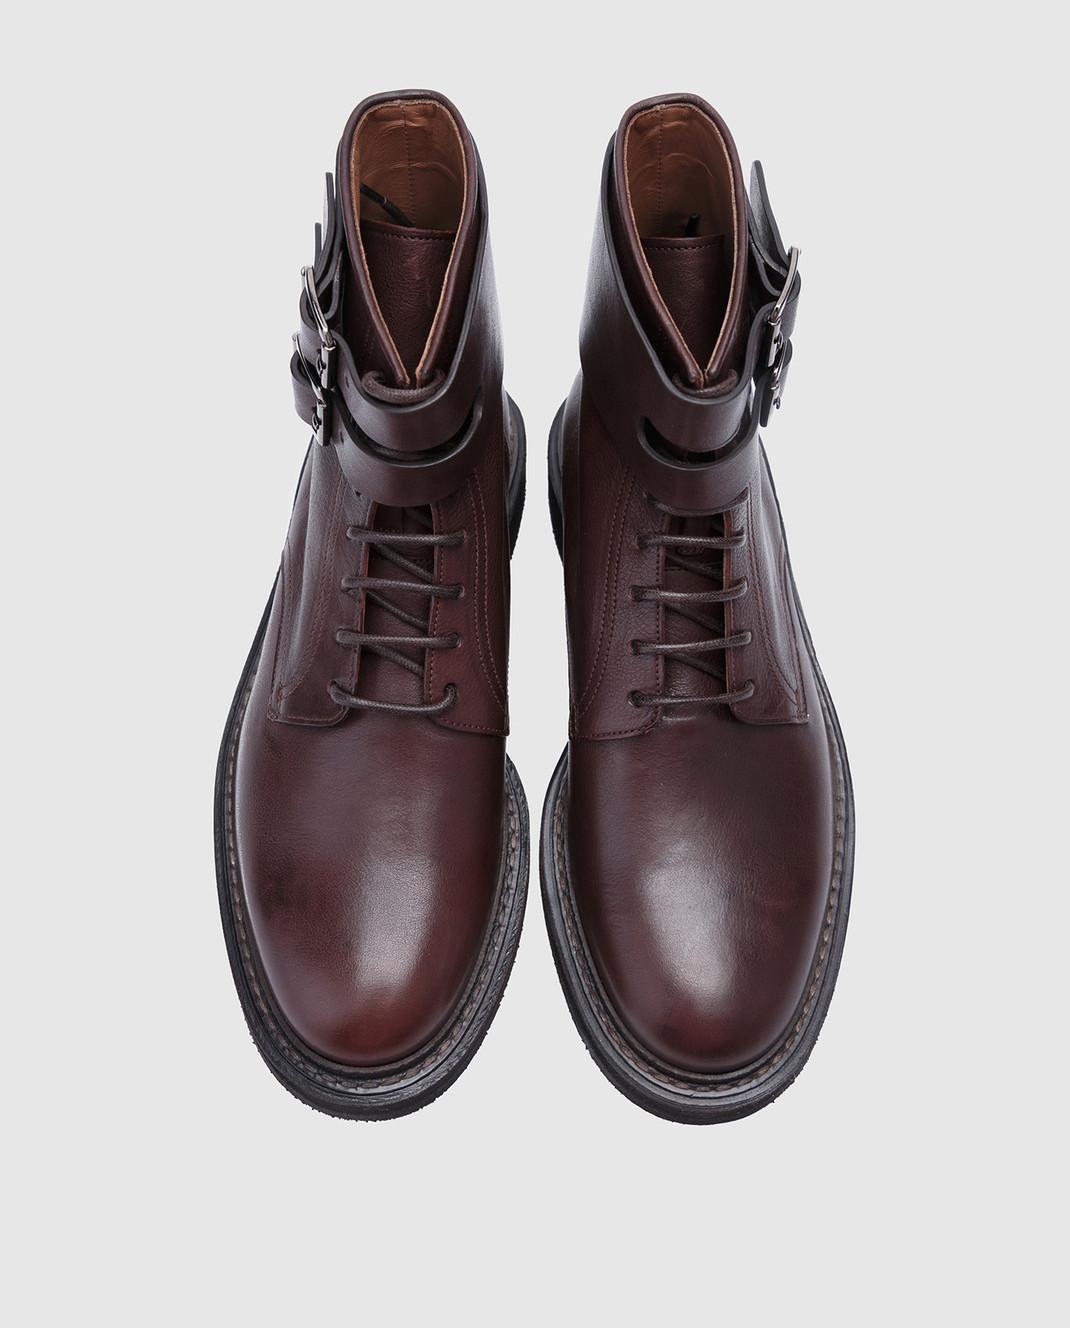 Brunello Cucinelli Темно-коричневые кожаные ботинки MZUSPFU174 изображение 4